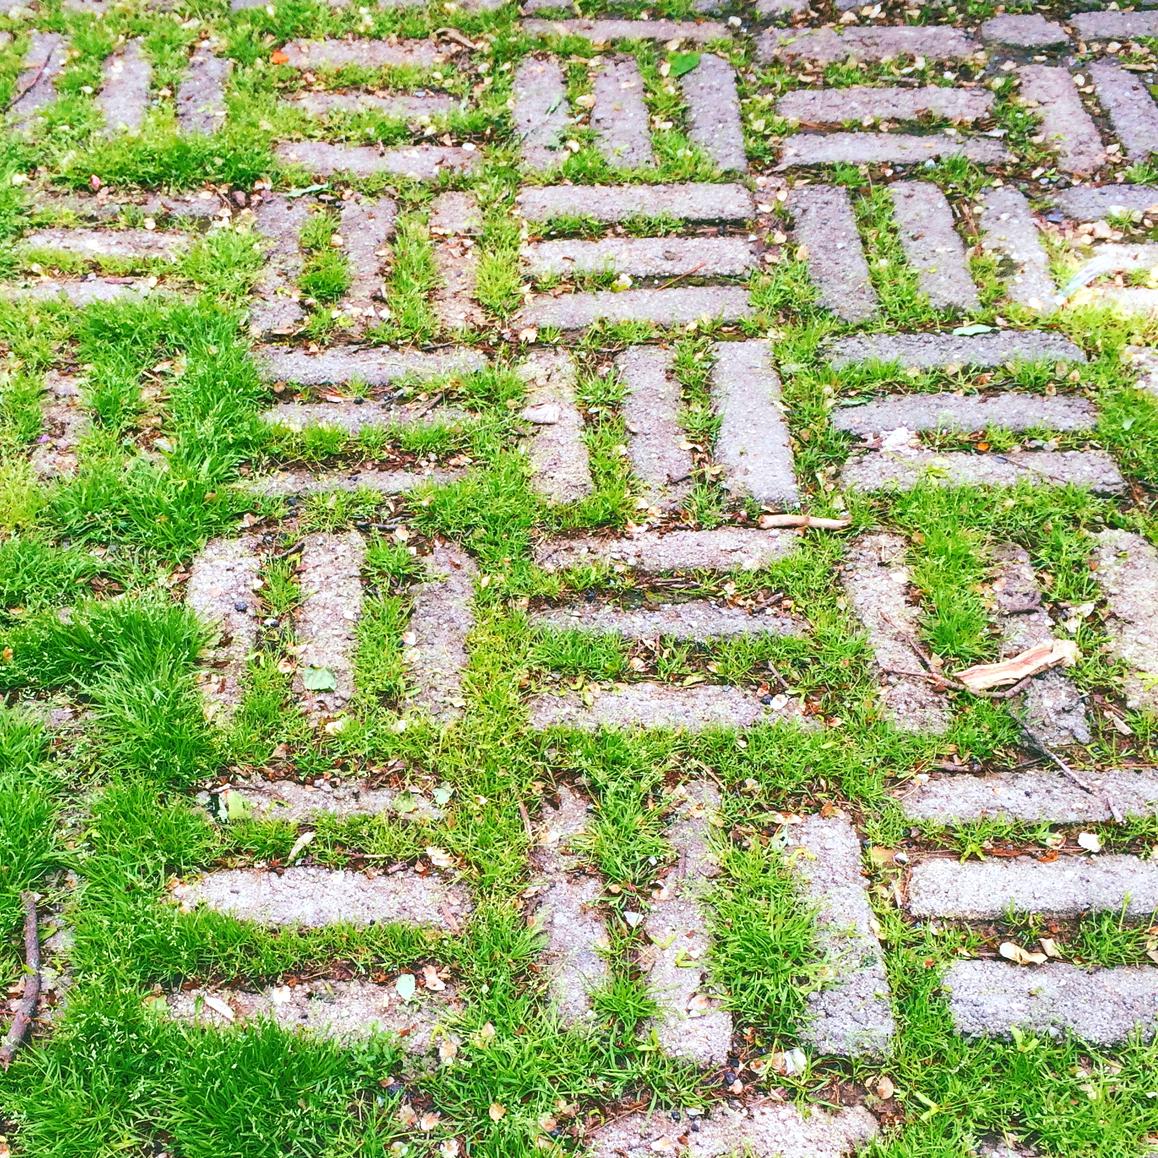 grass in a basketweave parquet pattern, outside prospect park on ocean parkway.